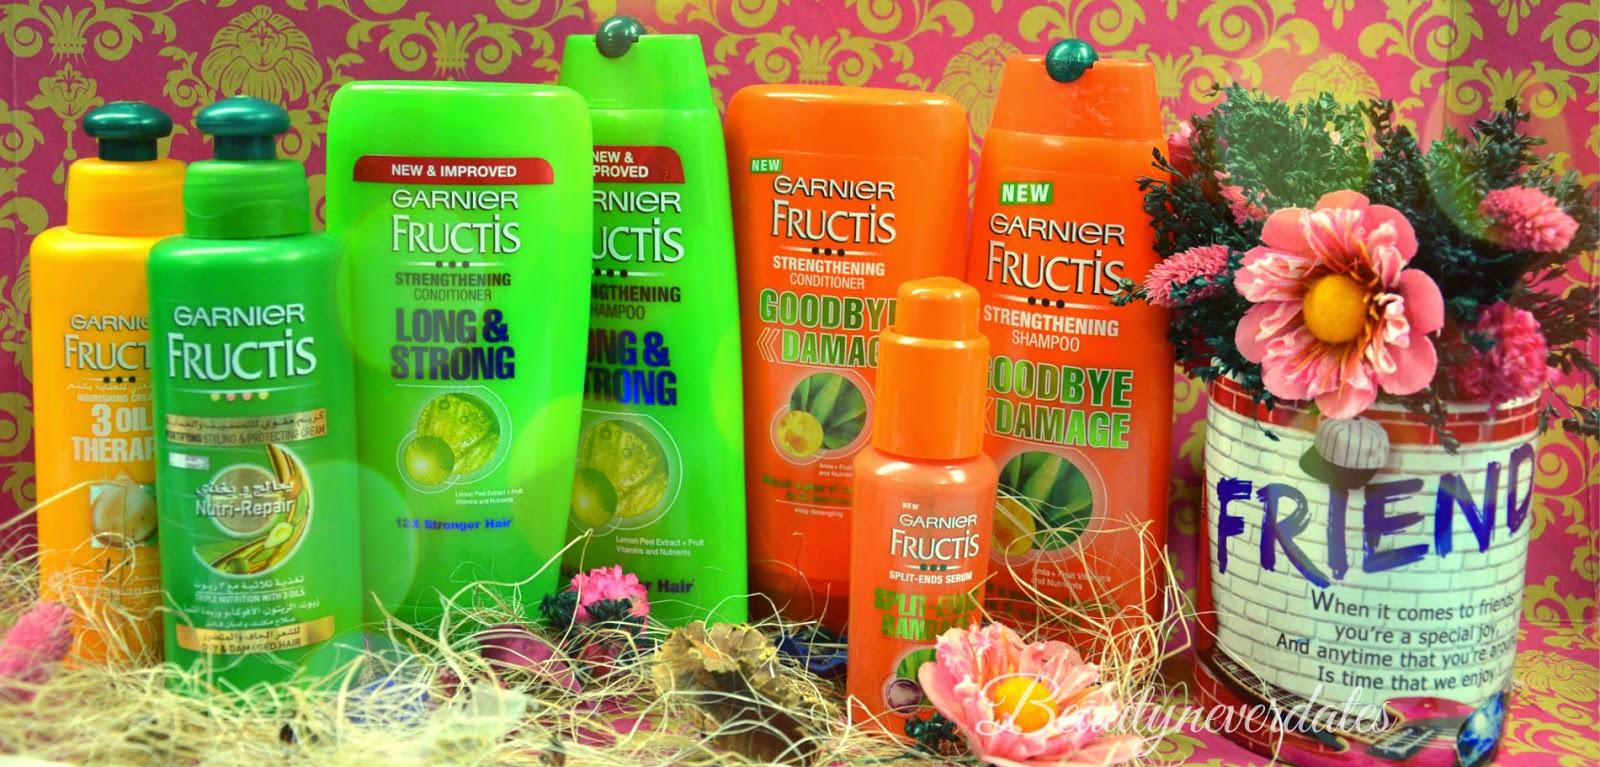 garnier shampoo product life cycle